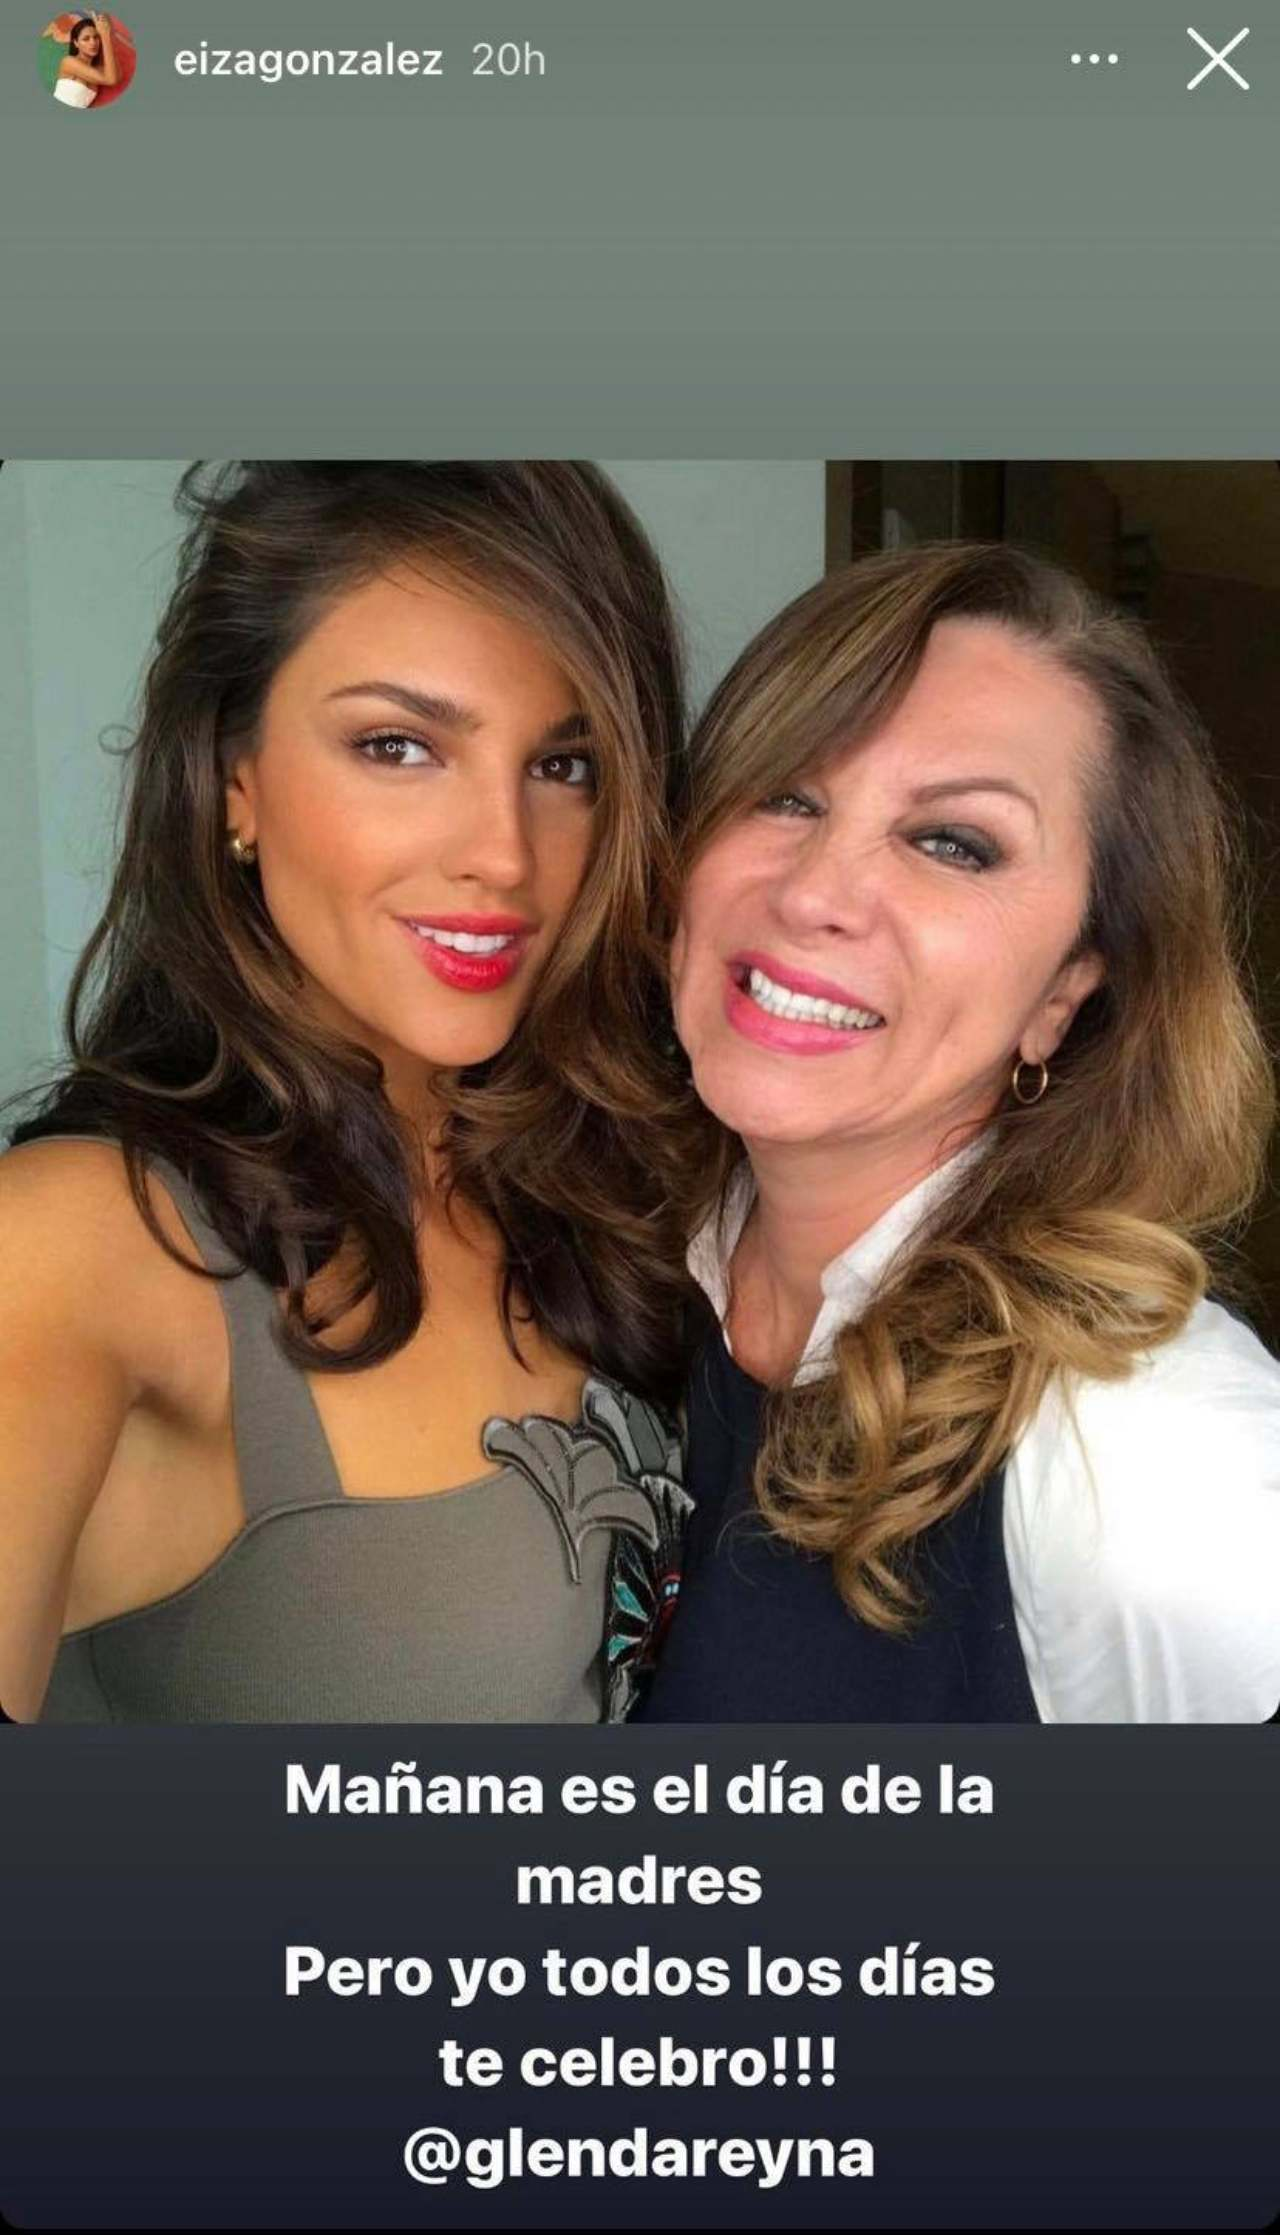 Eiza Gonzalez y su mama Glenda